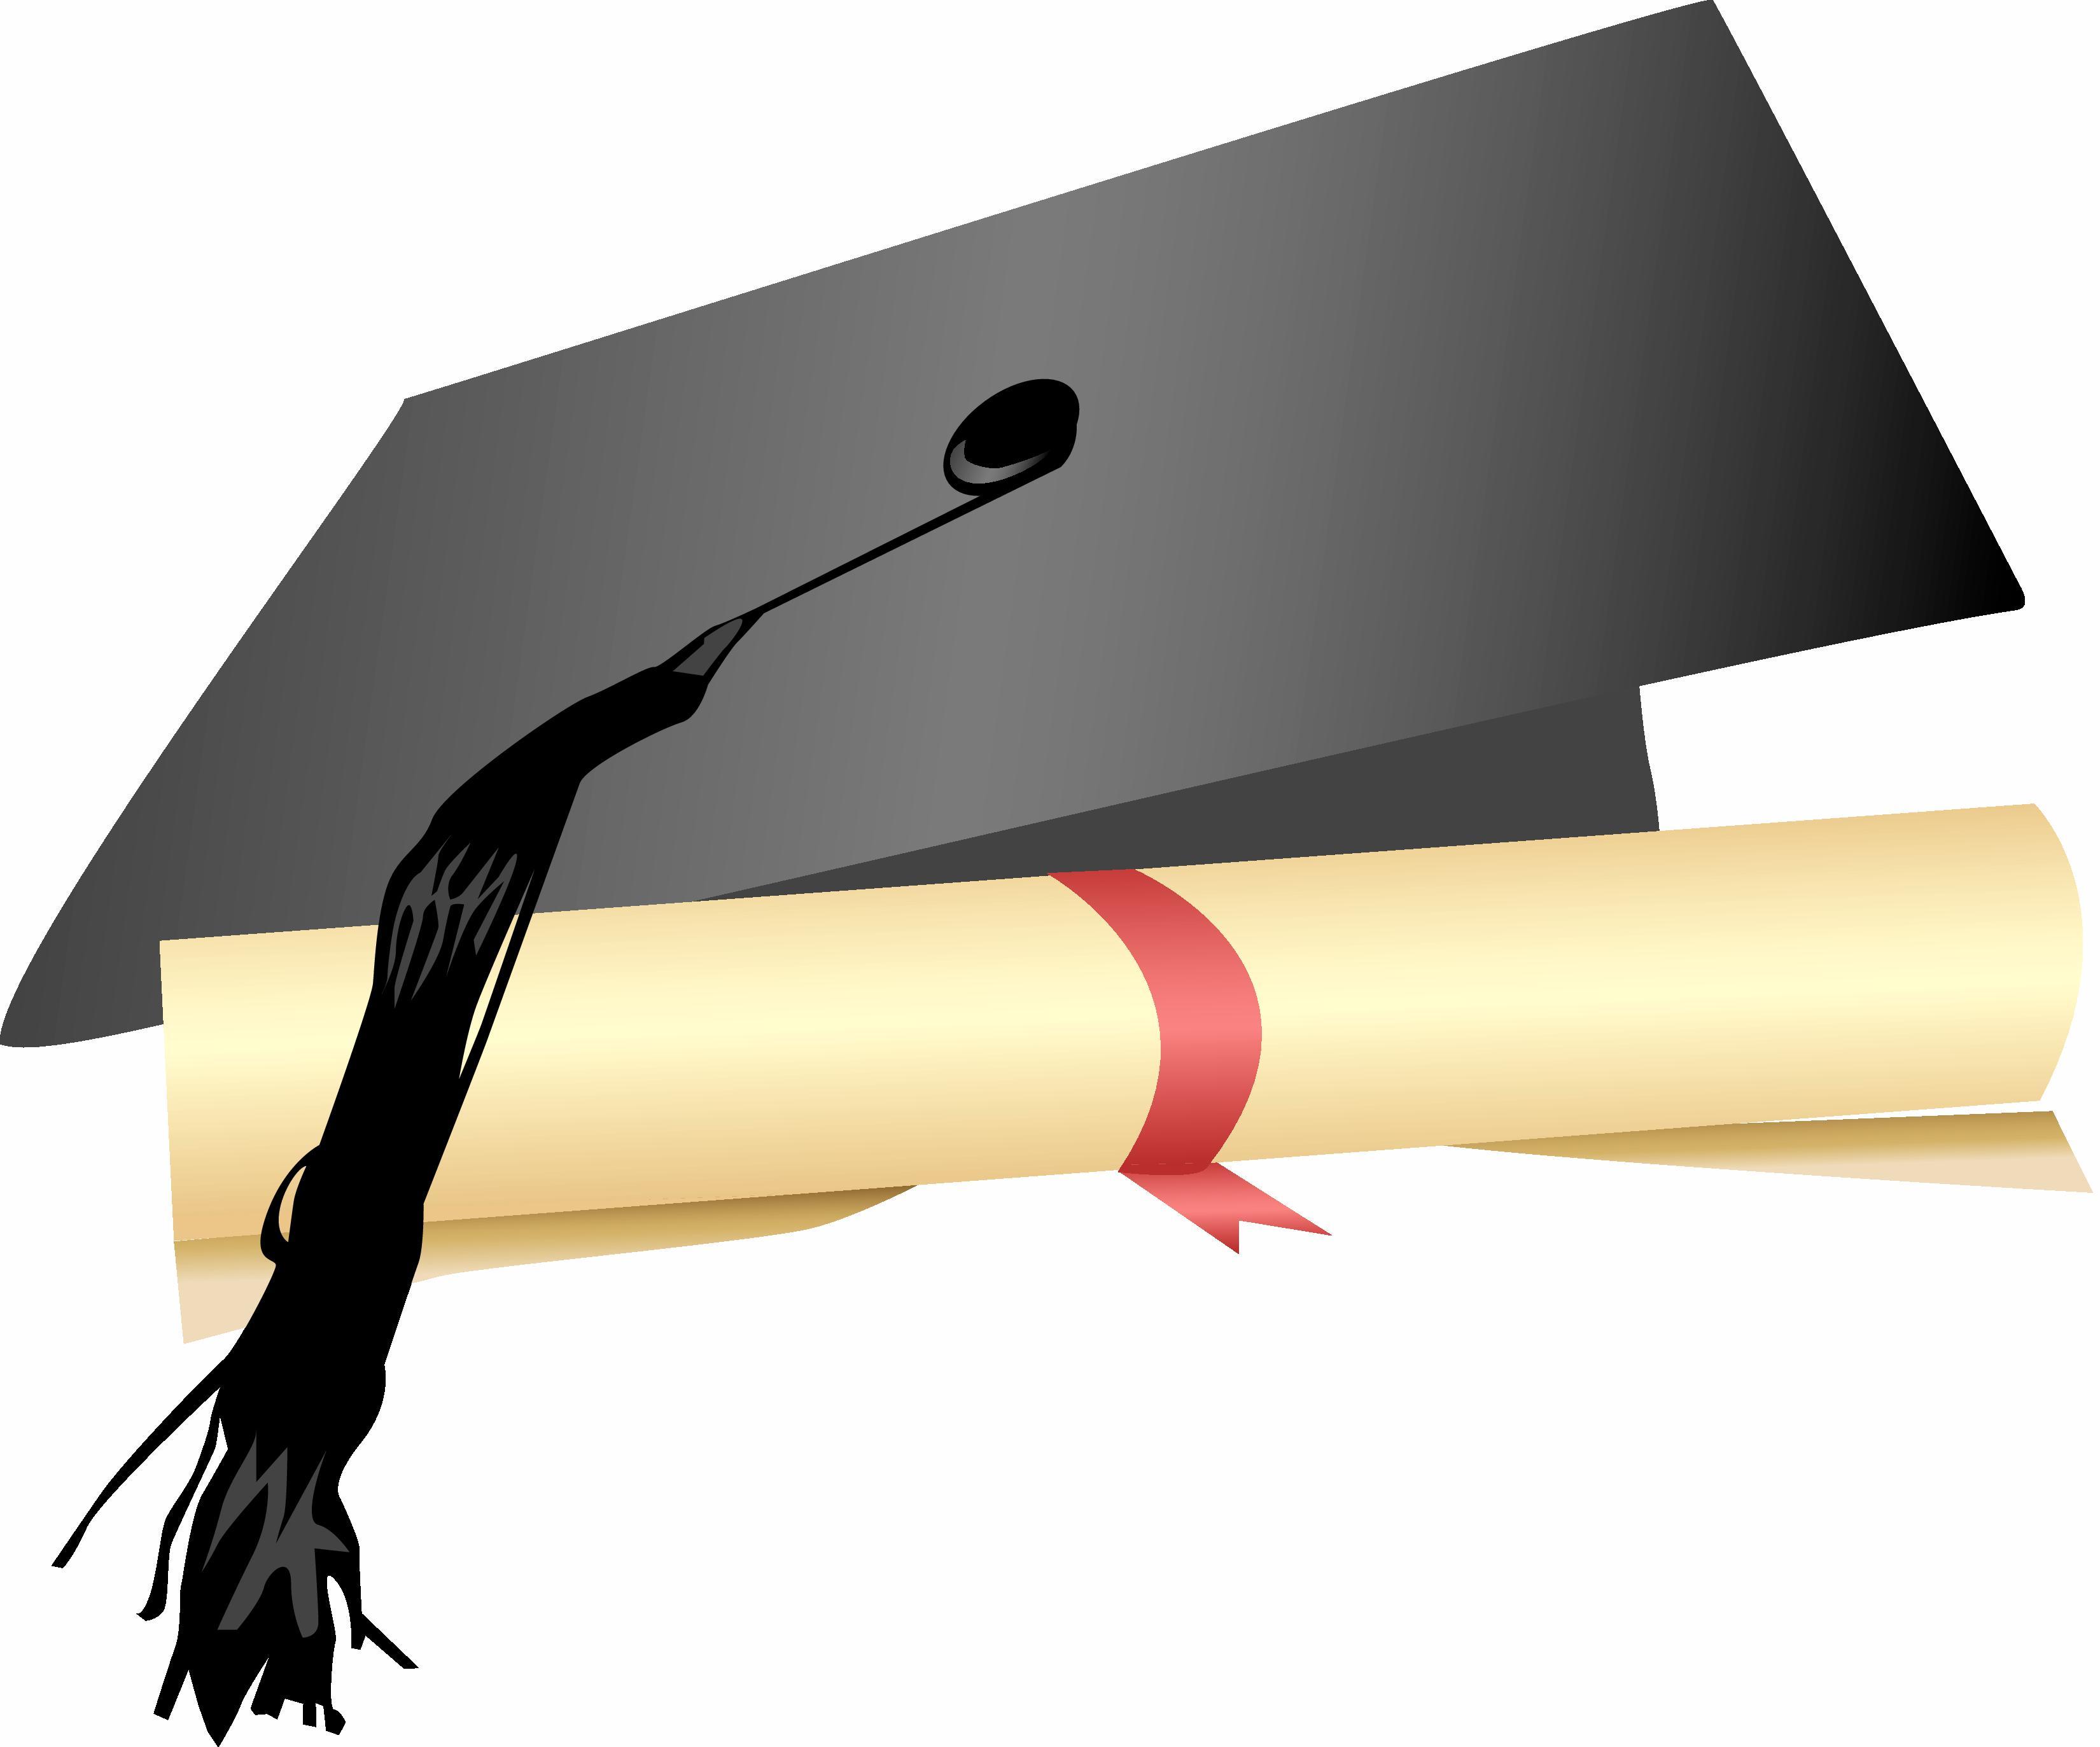 Free Diploma Cliparts, Download Free Clip Art, Free Clip Art.